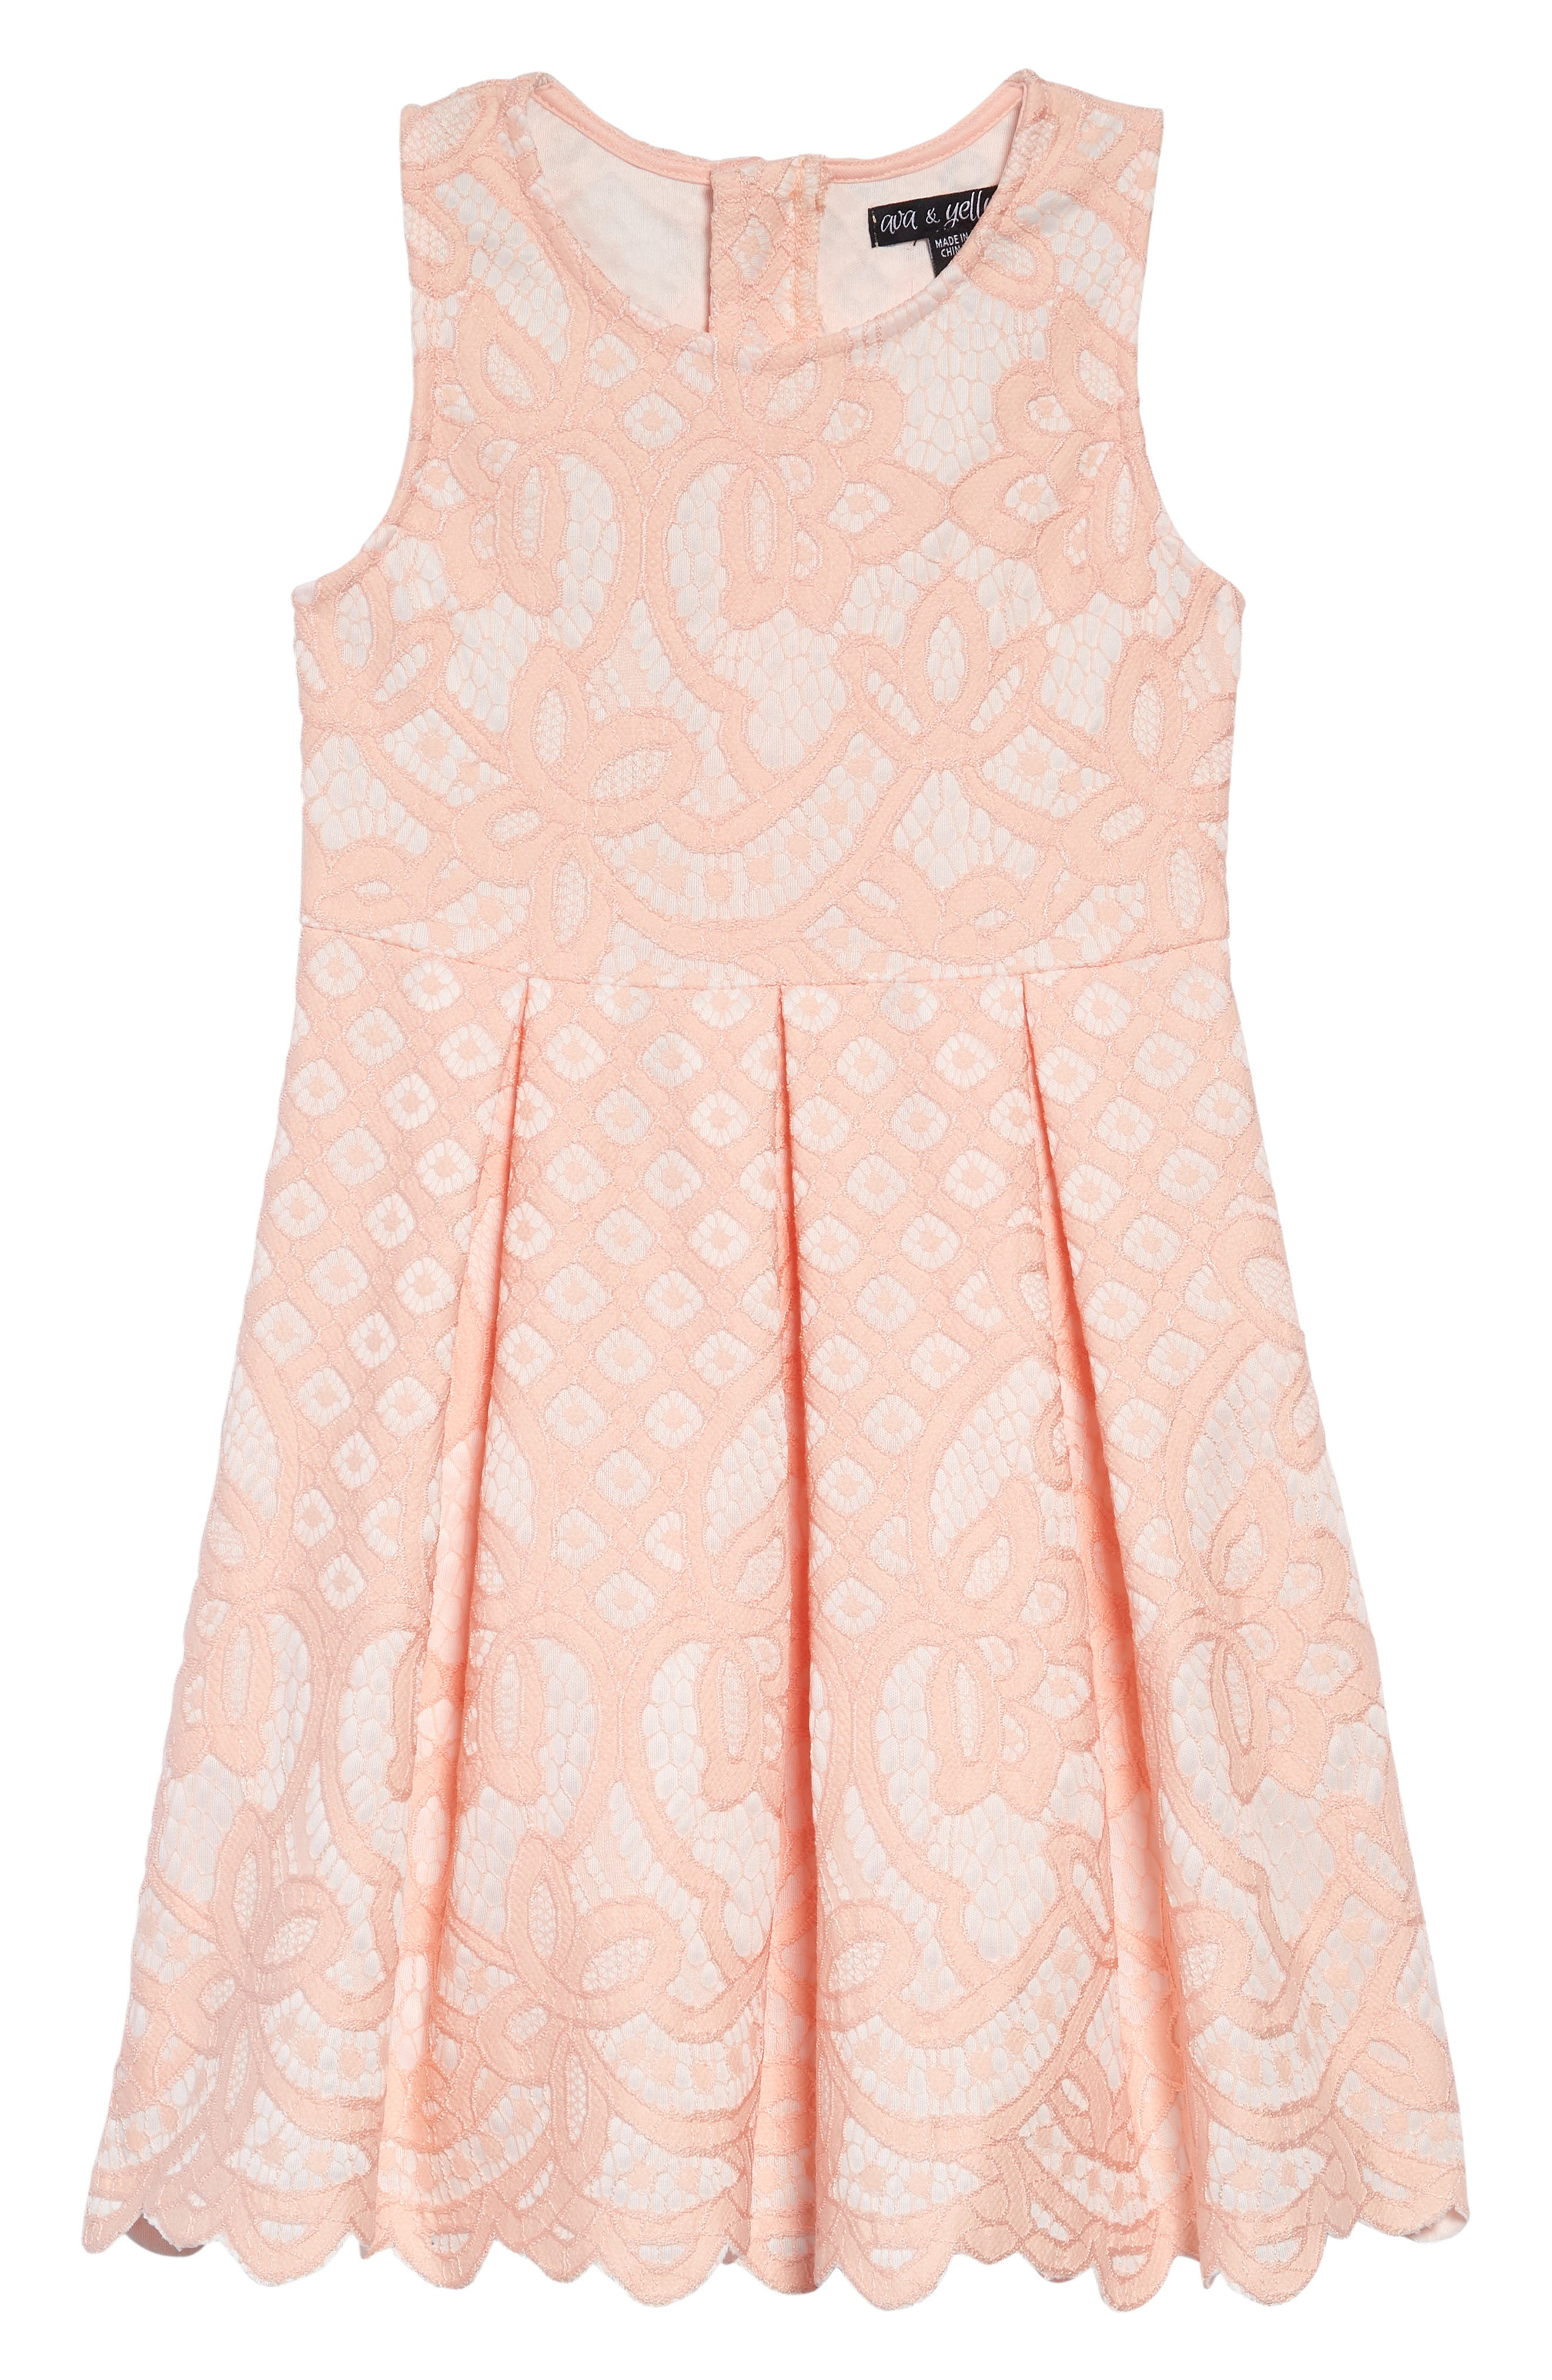 Two Tone Lace Dress,                             Main thumbnail 1, color,                             681